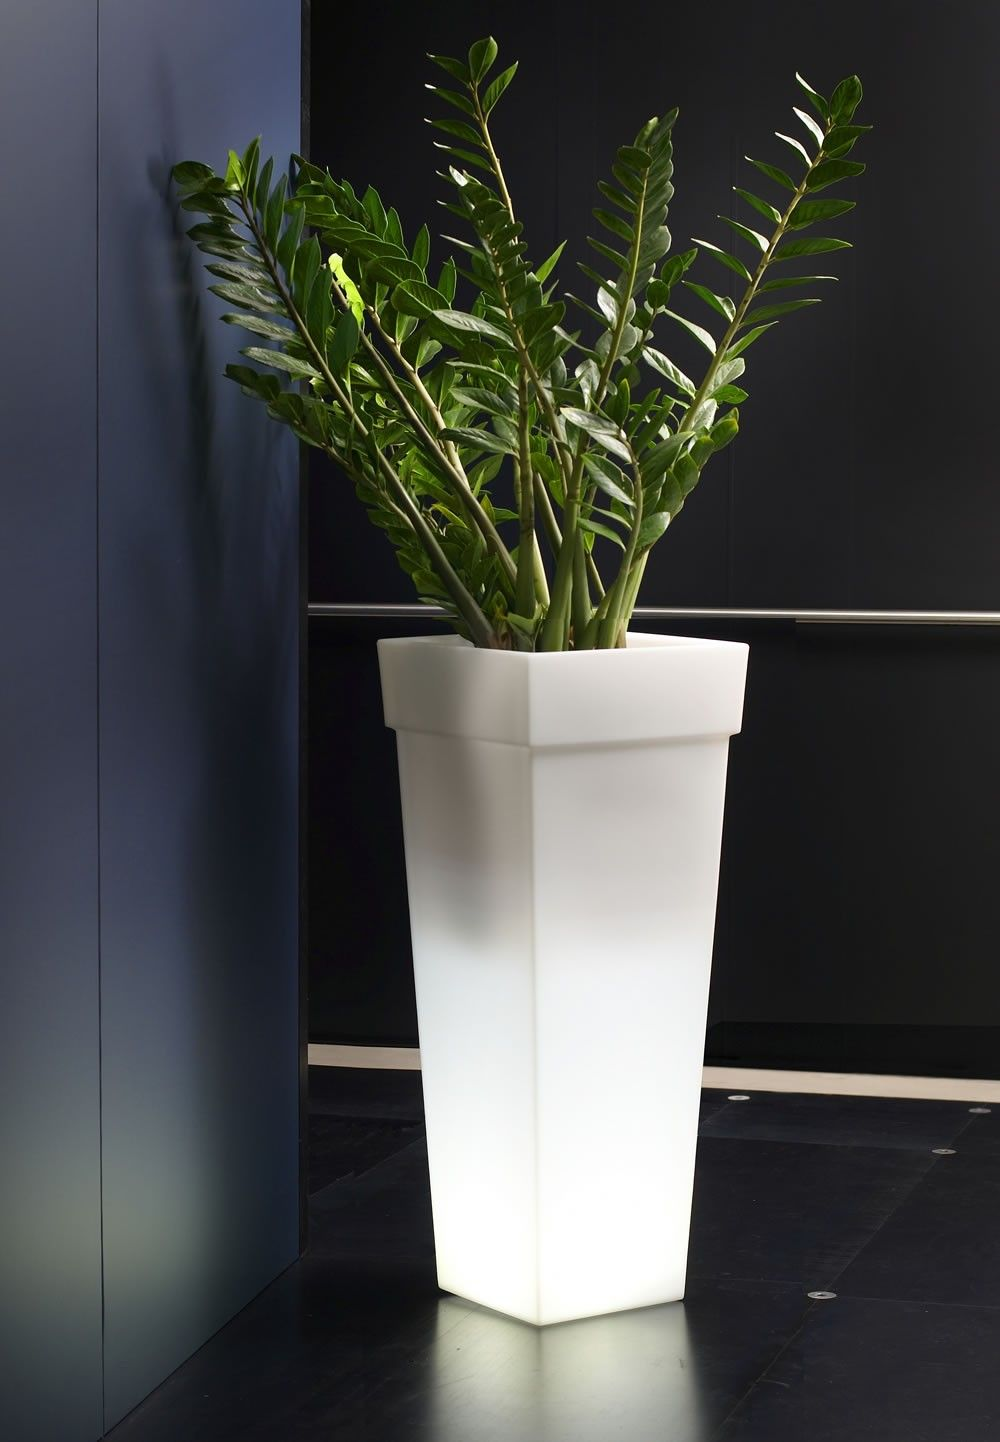 Vasi luminosi alti serie geryon con vasi alti da interno for Vaso da interno moderno